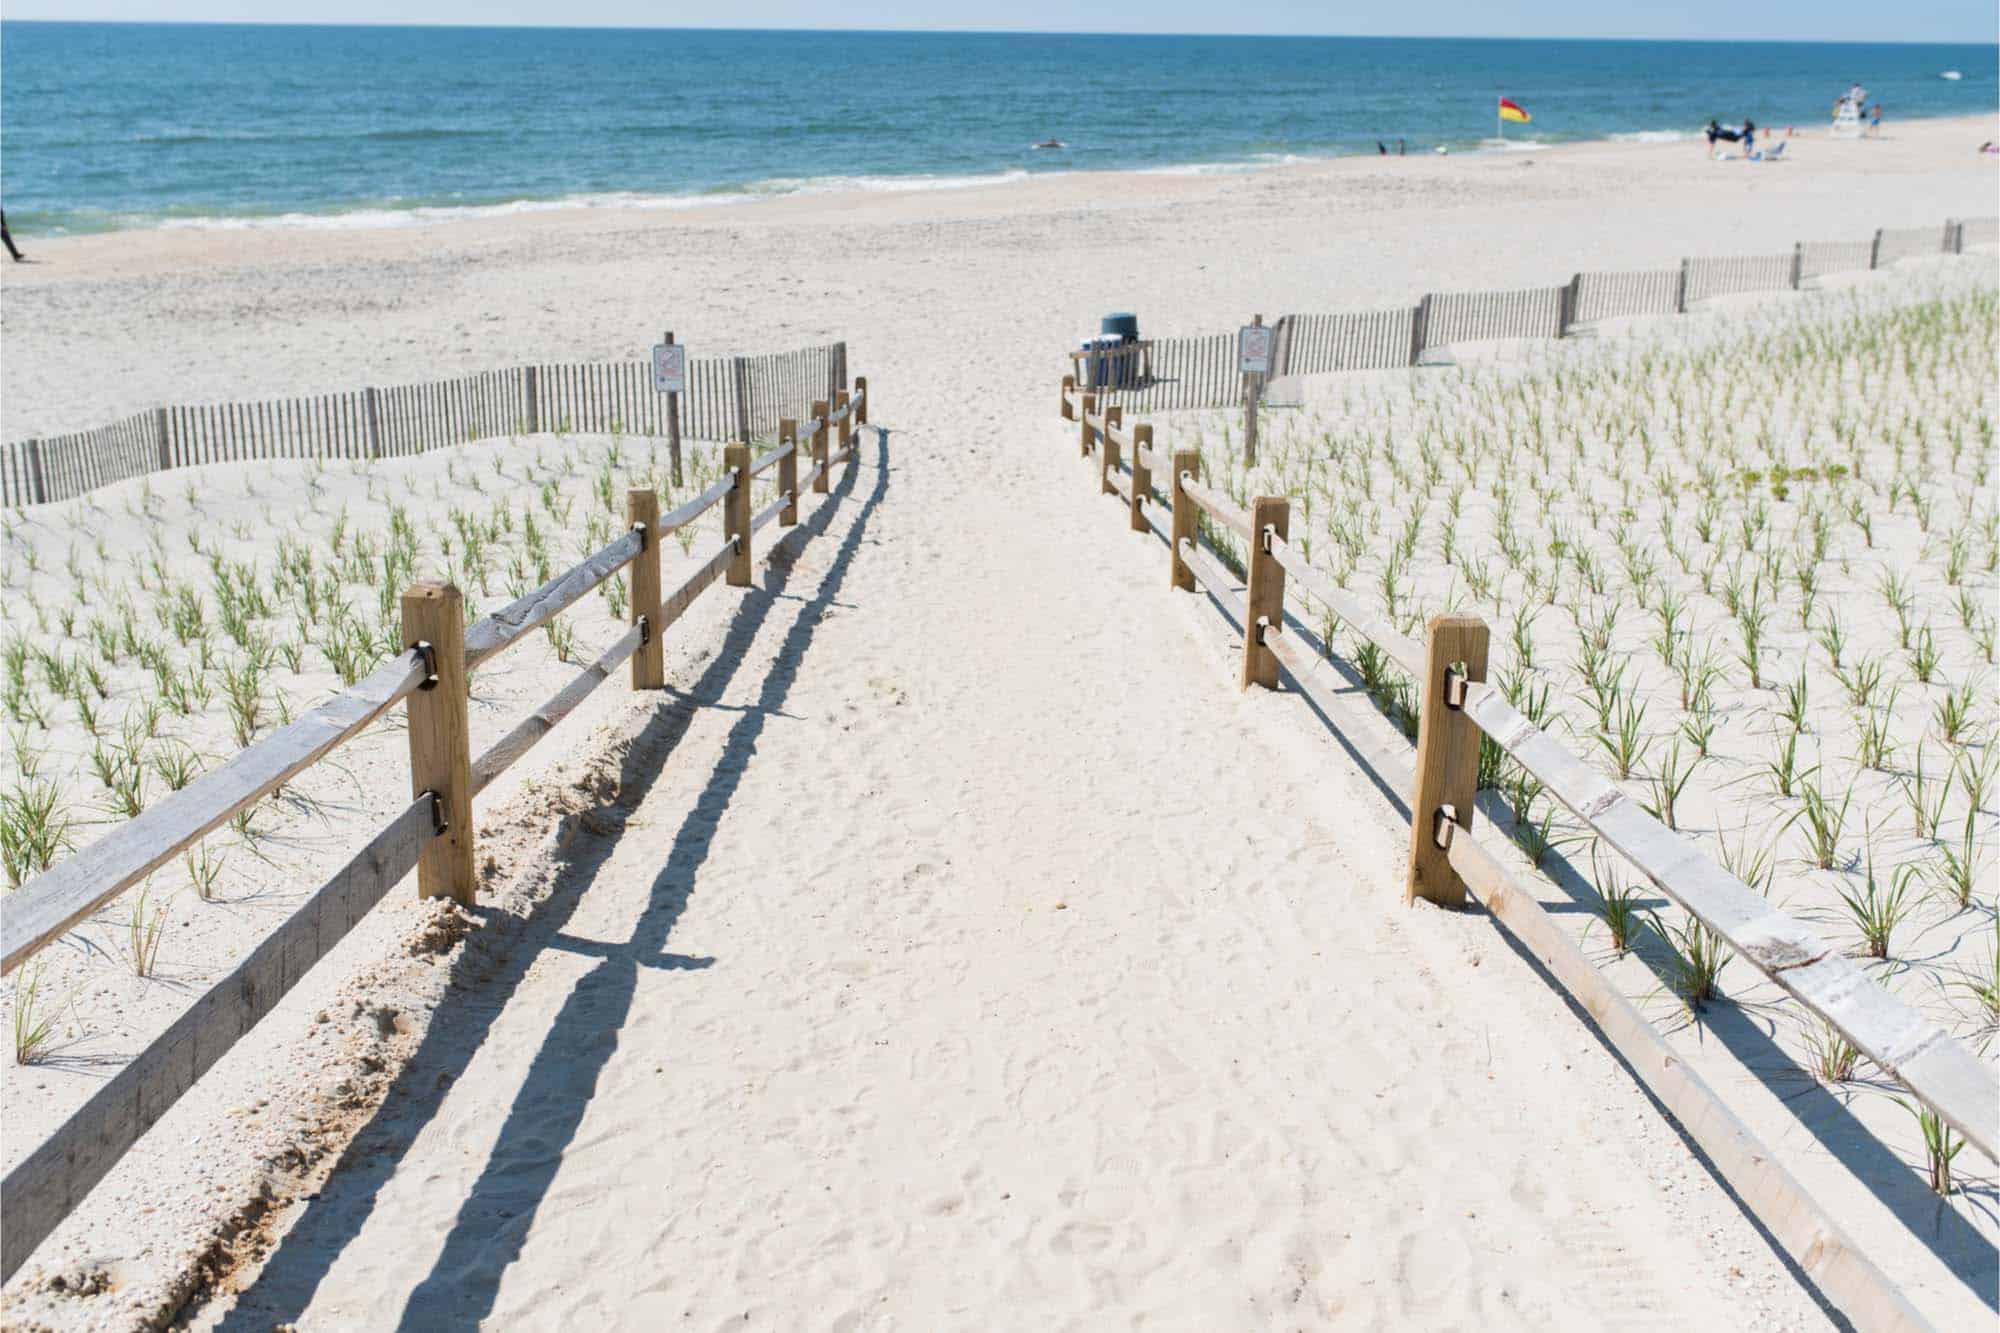 Sandy walkway leading to beach